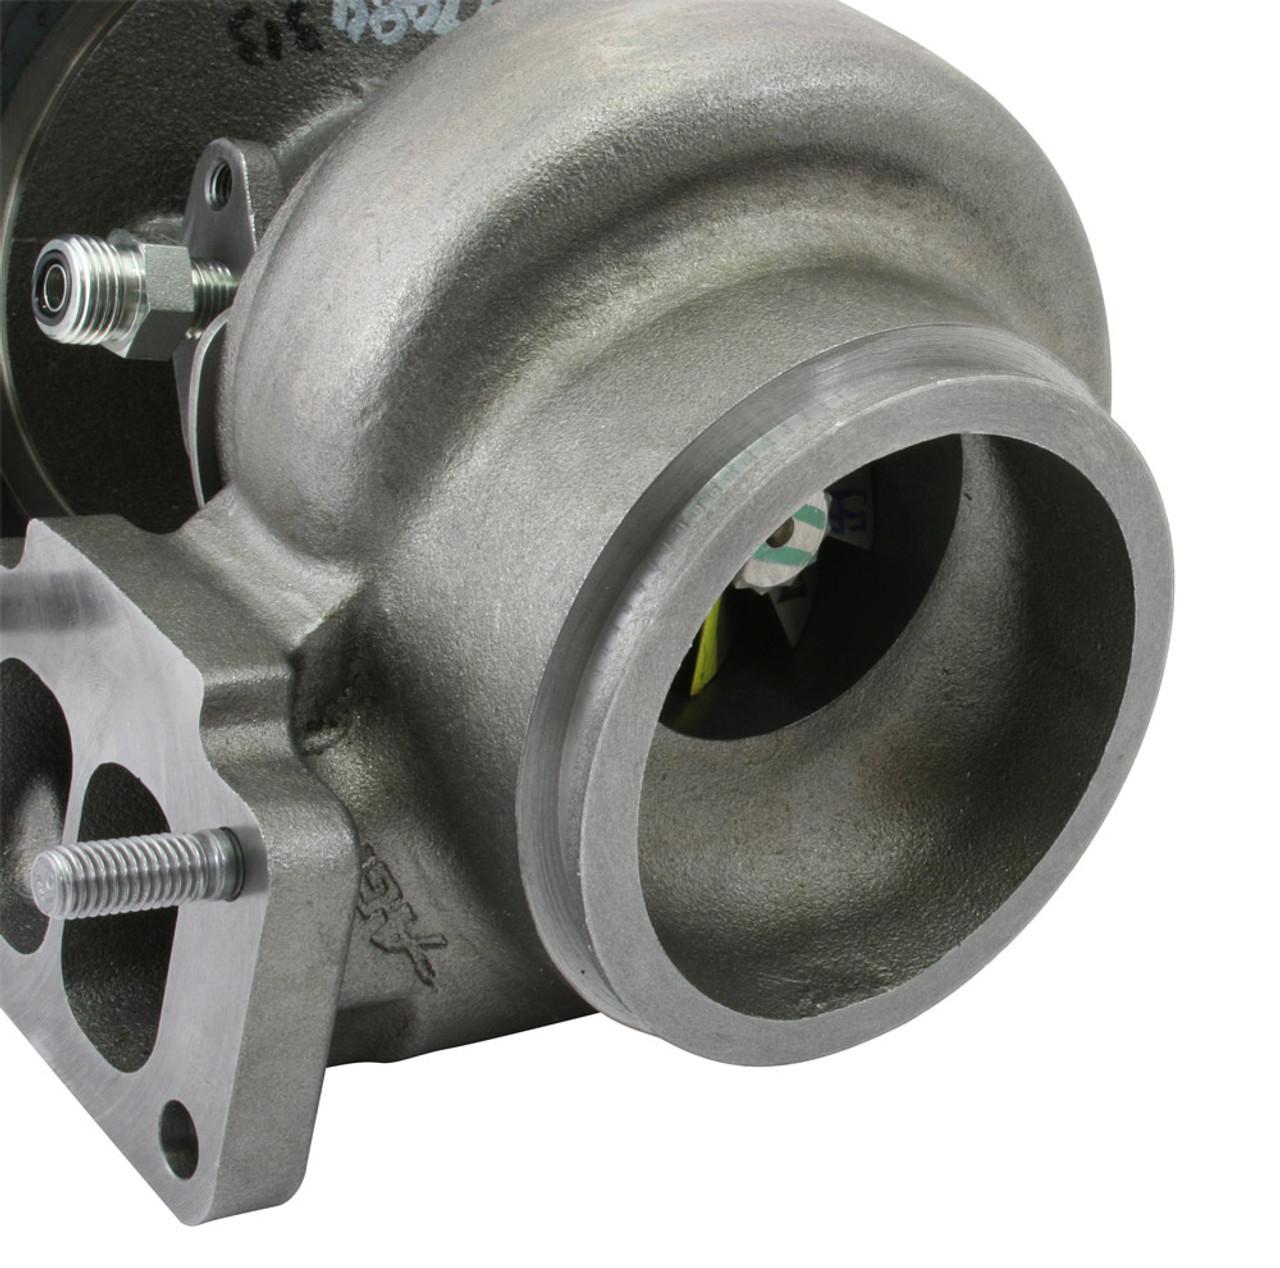 Precision Turbo Cummins: Borg Warner / AGP S300 SXE Non-Wastegated 3rd Gen Cummins